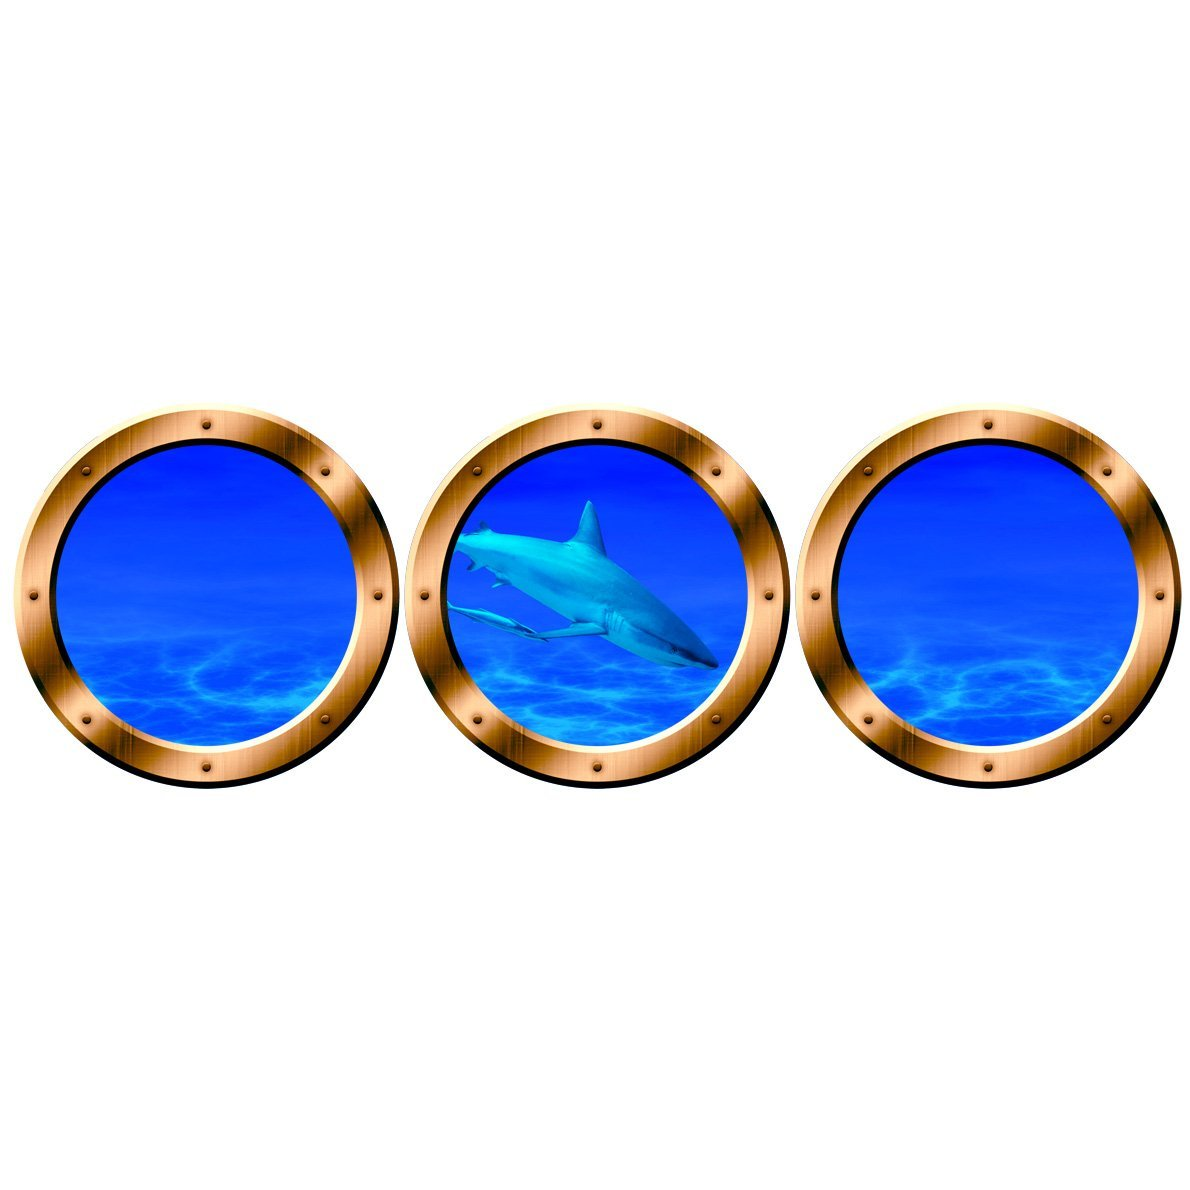 "VWAQ Submarine Porthole - Shark Wall Decals, Underwater Ocean Decor - VWAQ-SPW16 (20"" Diameter, Gold)"